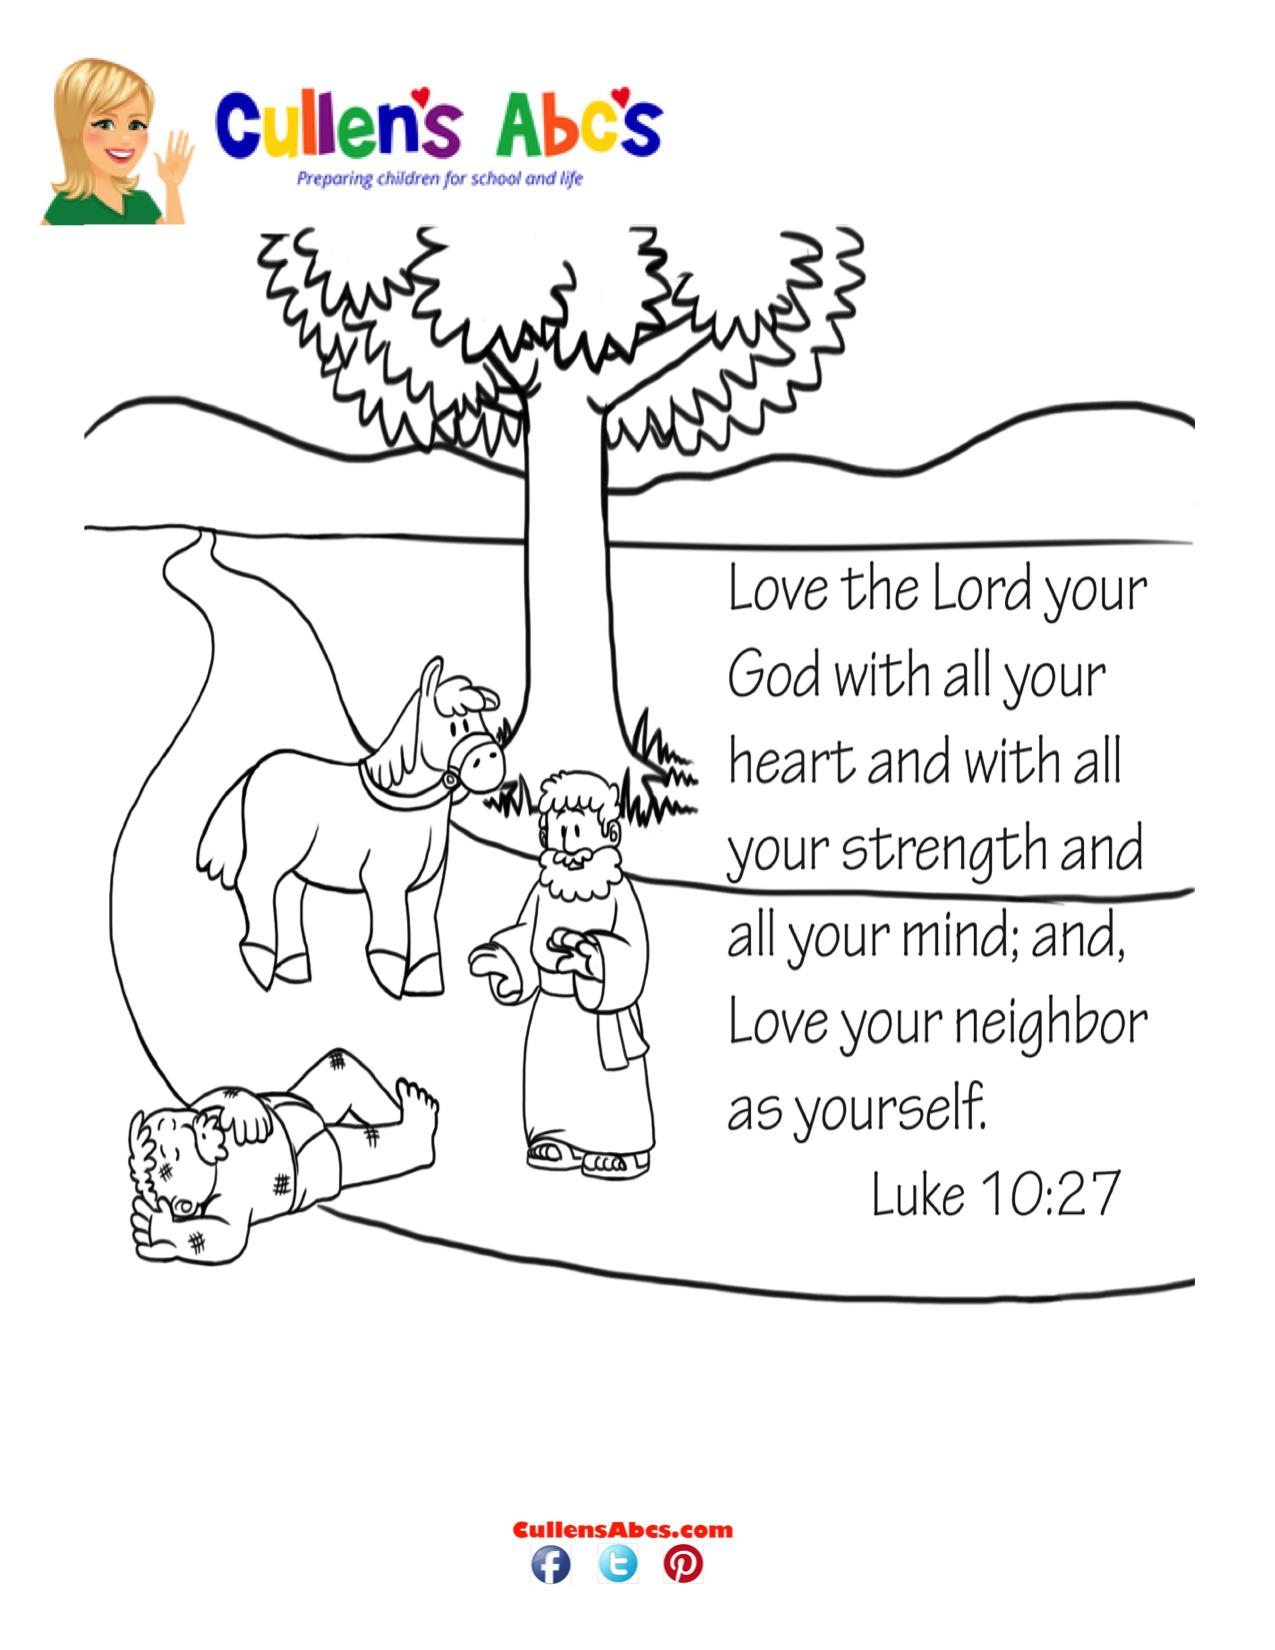 Free coloring page key - Free Coloring Page Good Samaritan Bible Key Point Coloring Page The Good Samaritan Download